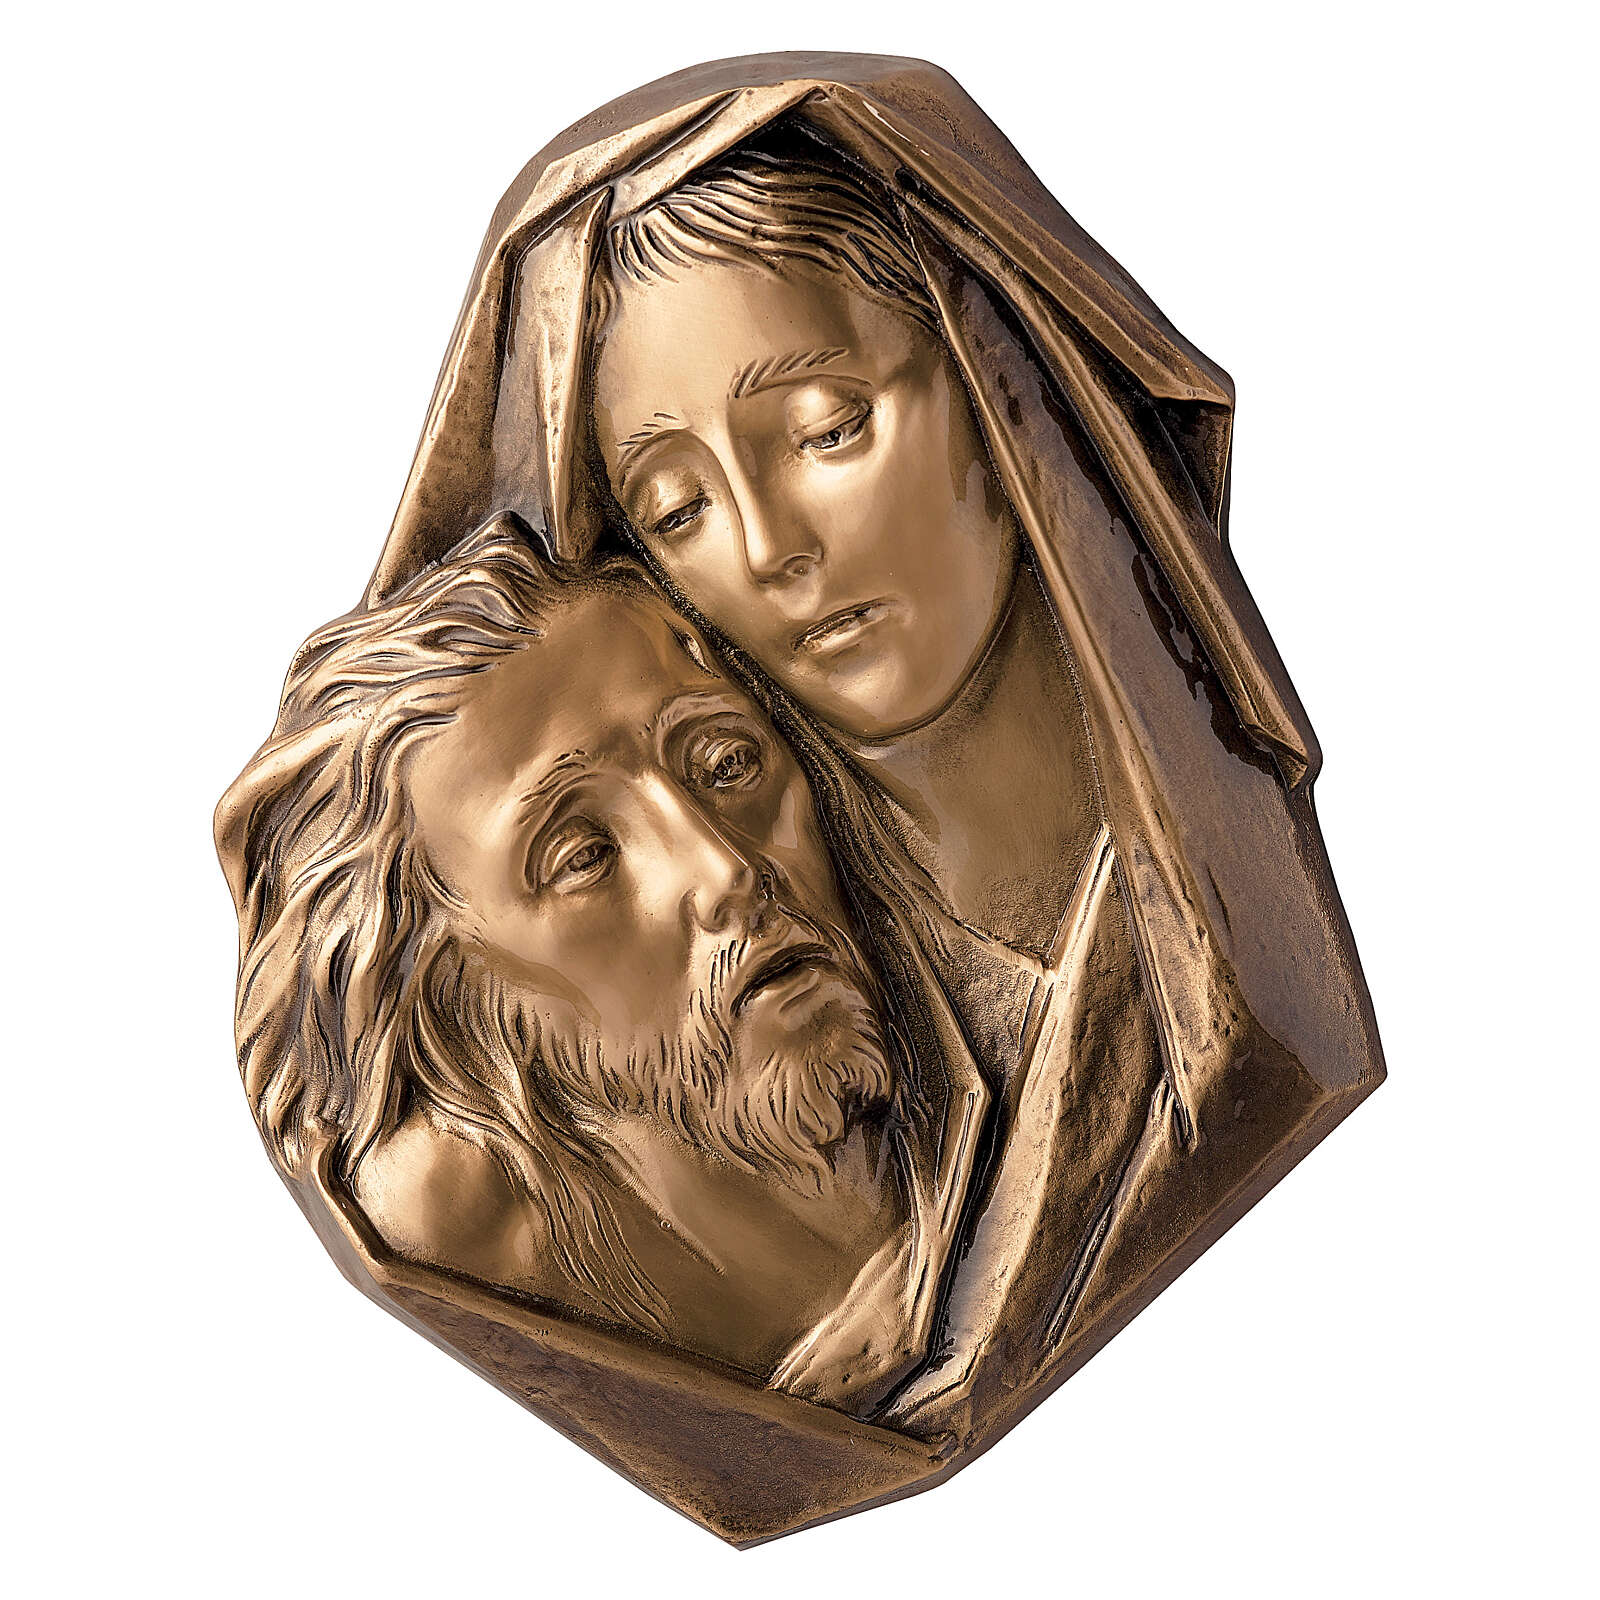 Michelangelo Pieta plaque close-up, bronze 33 cm for OUTDOORS 3